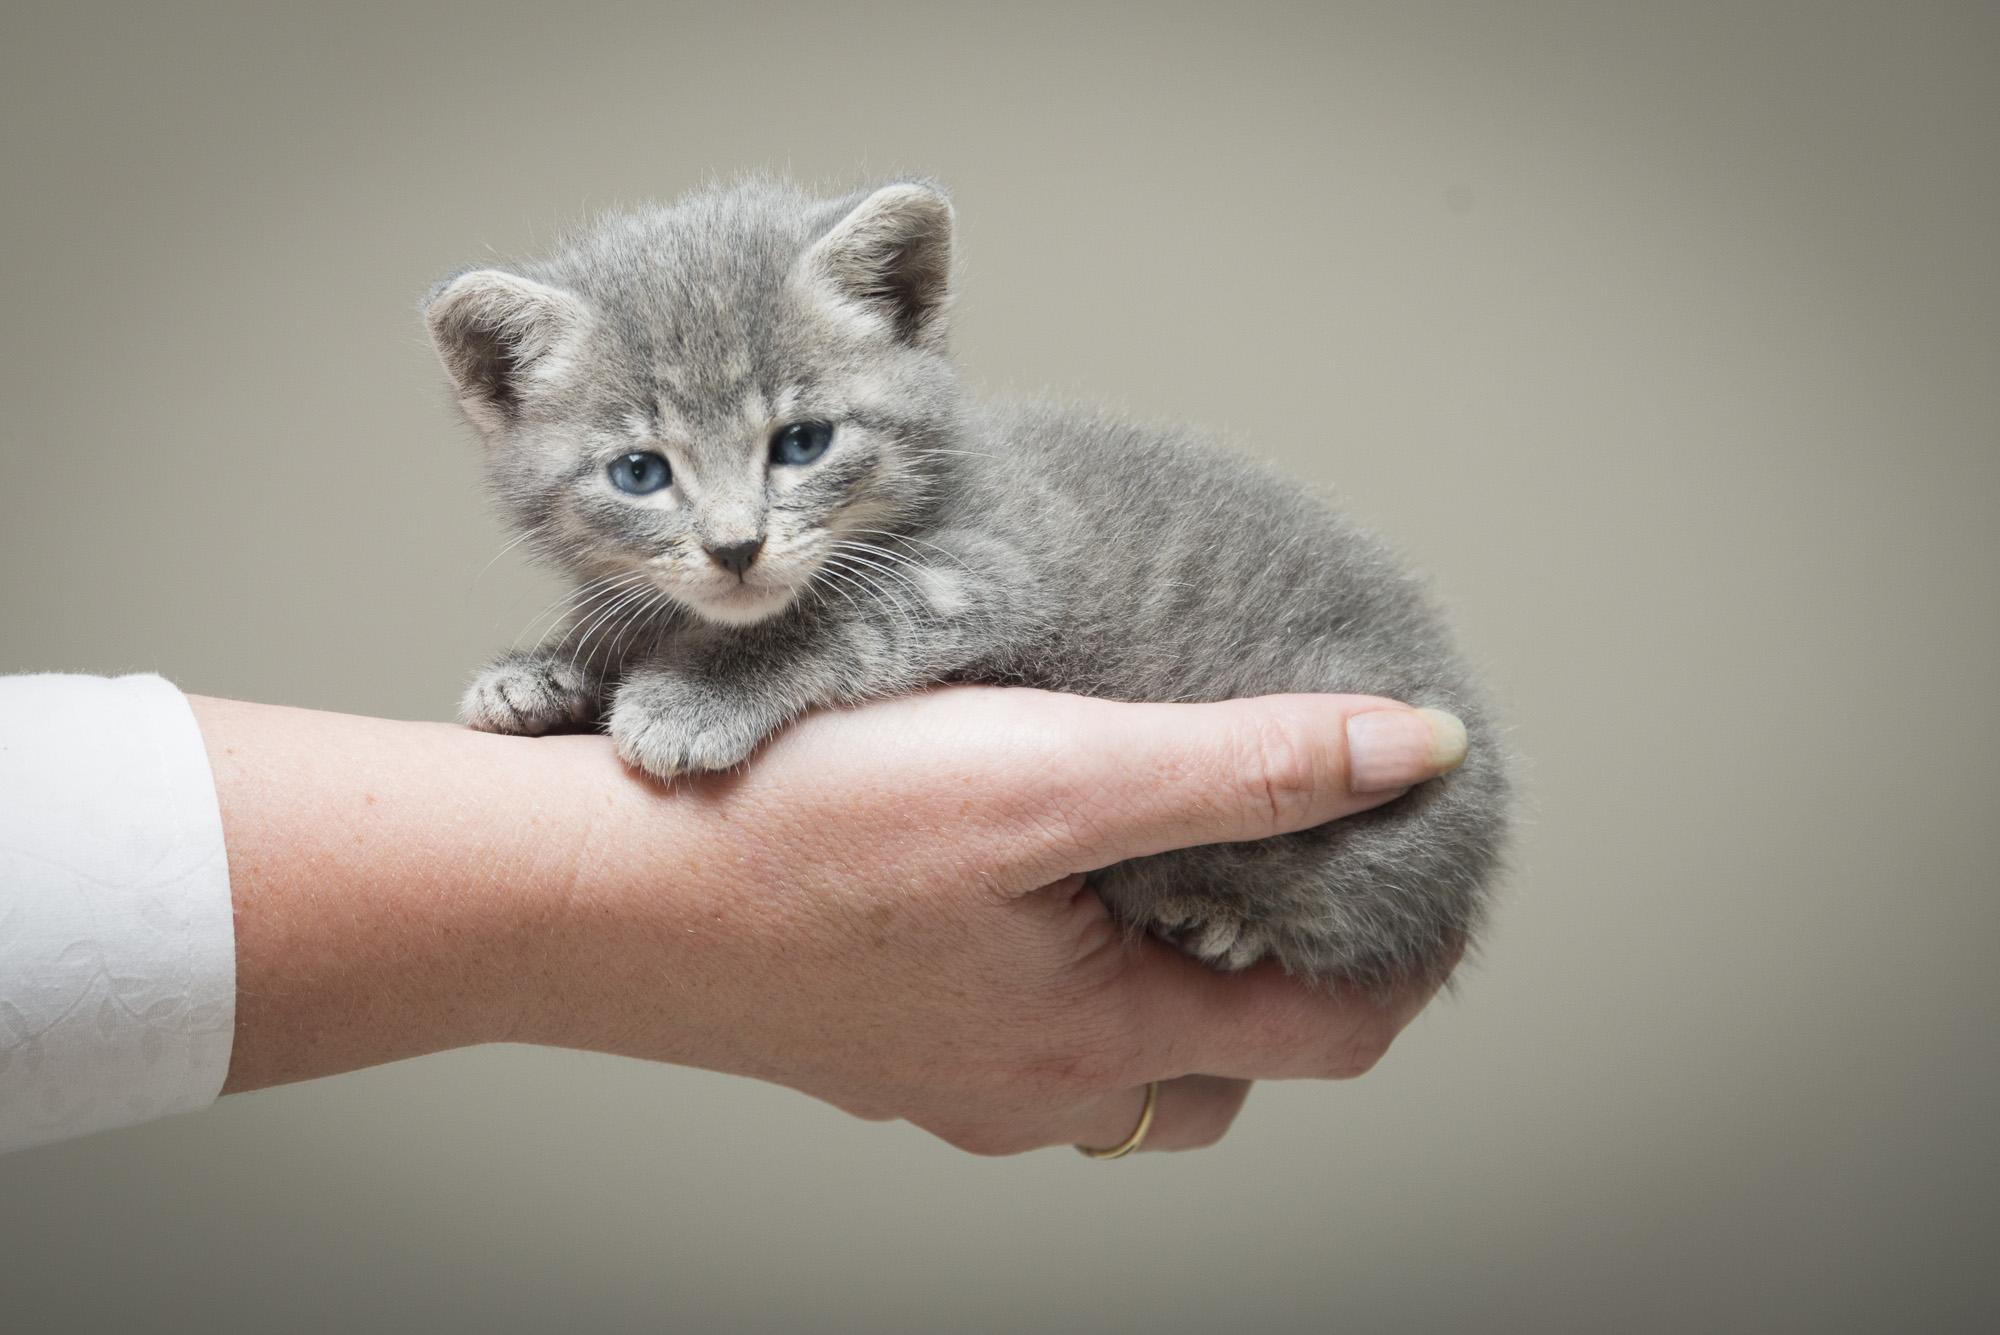 LupinBay-0116-Gray-Kitten-Pet-Photography-1263.jpg